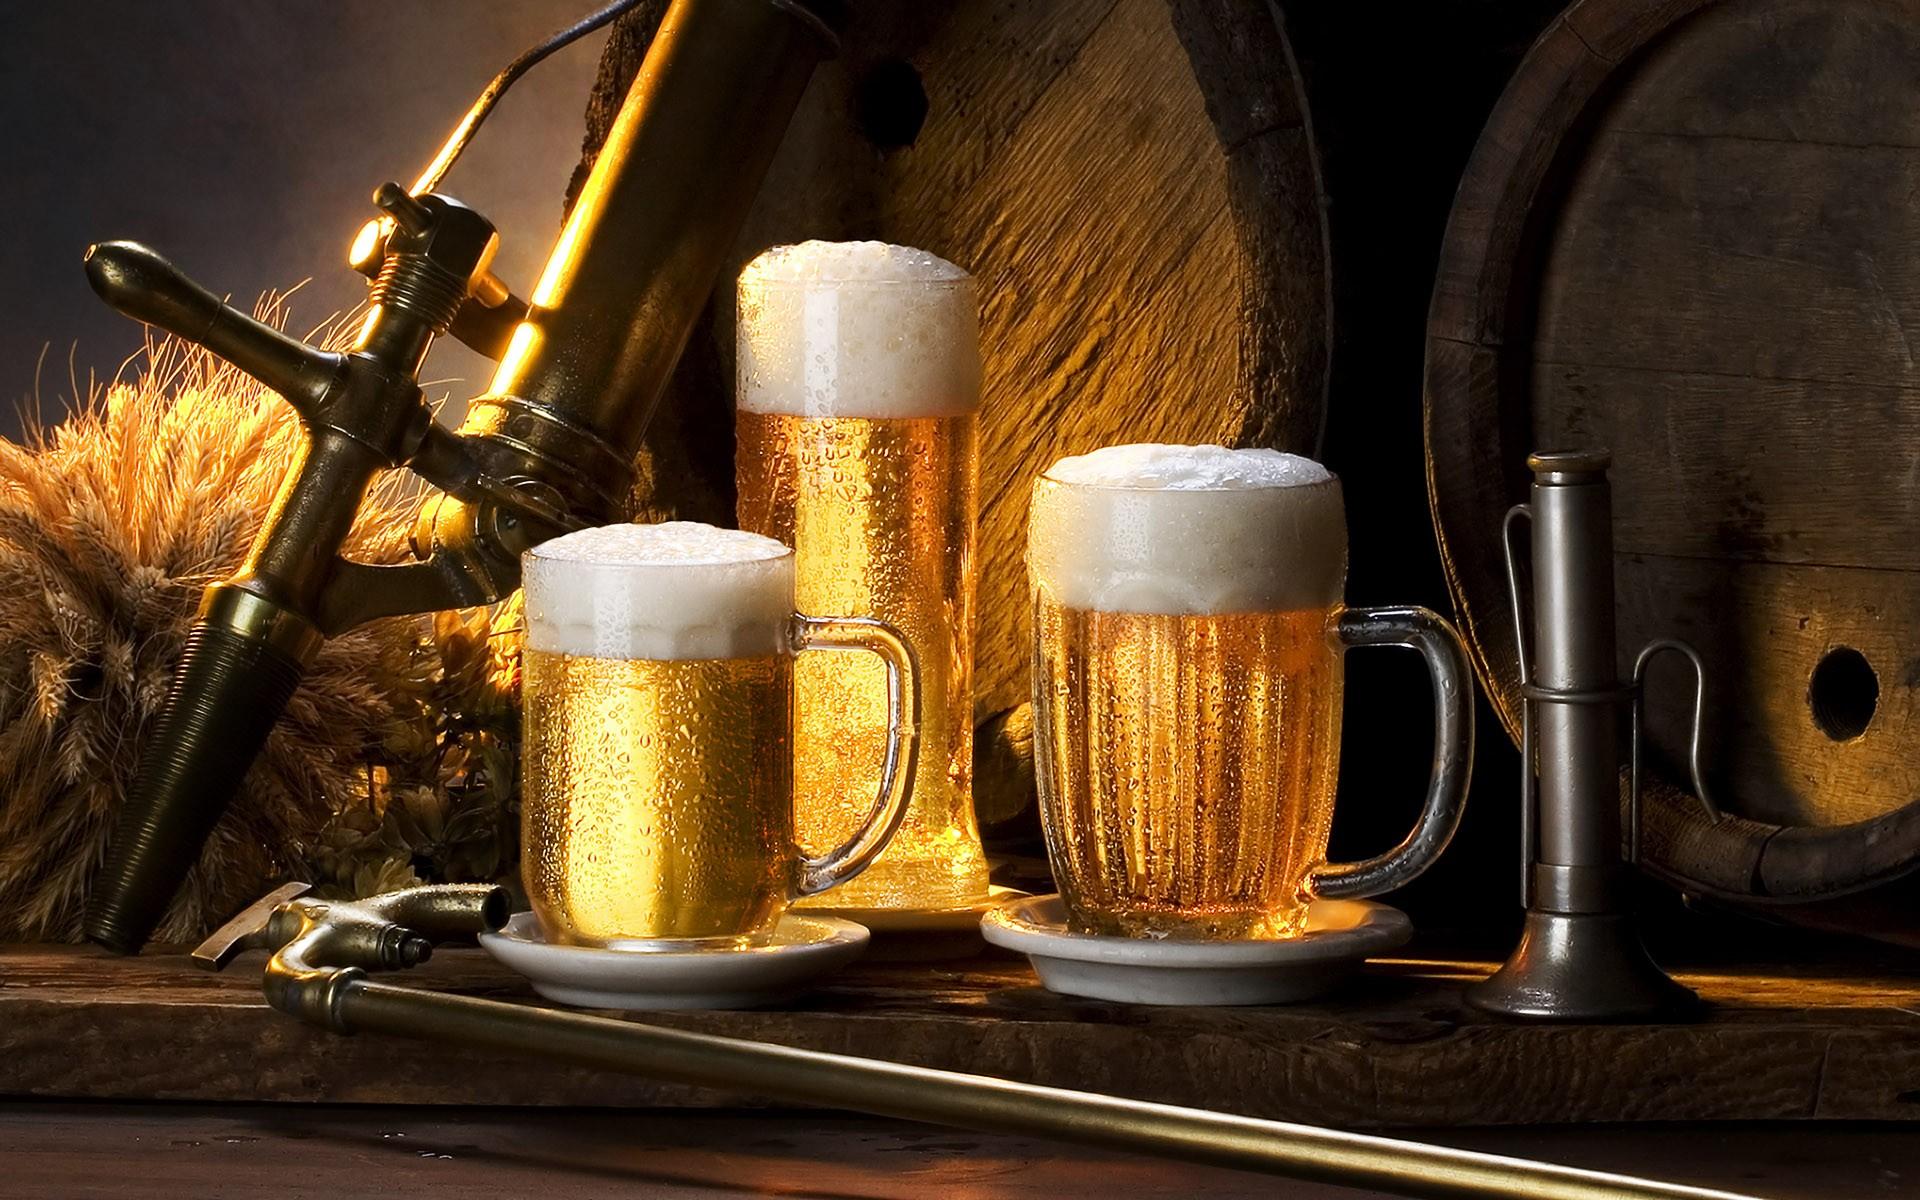 Chops de cerveza - 1920x1200